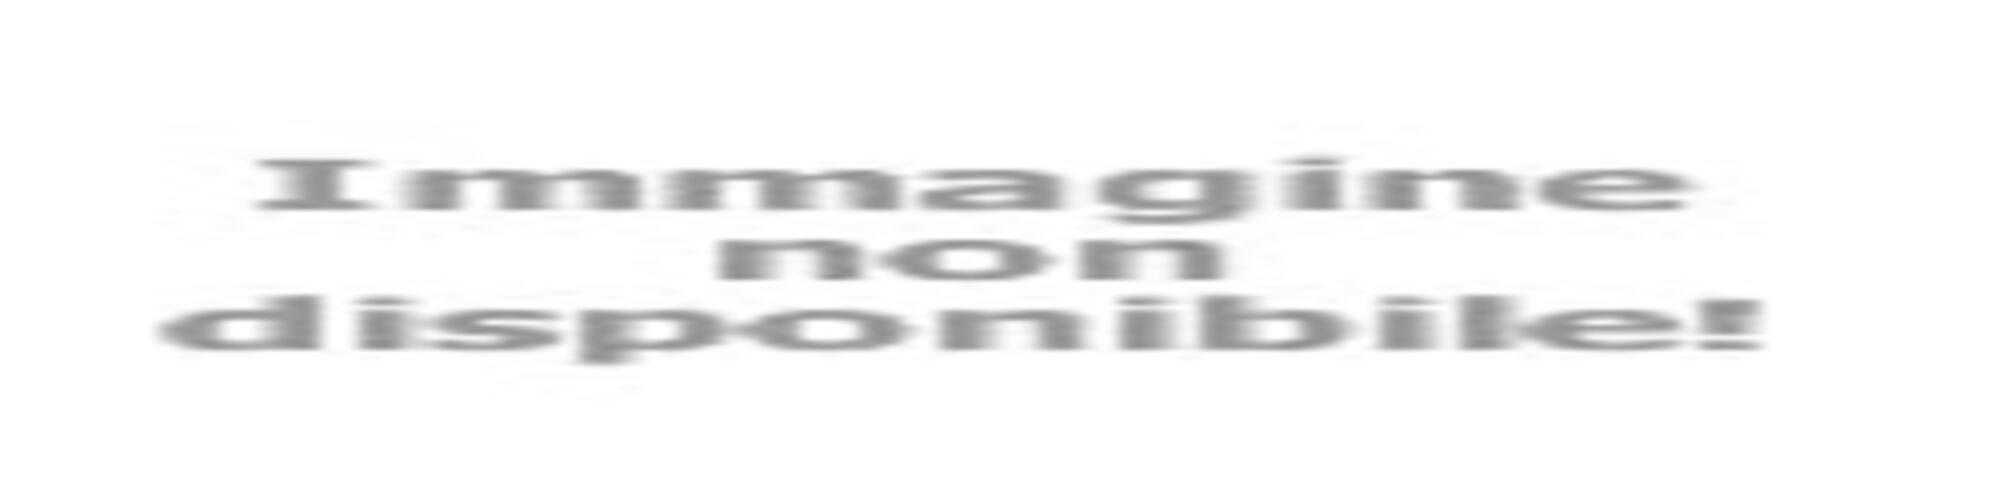 Gestione Patrimoniale BSM Innovazione